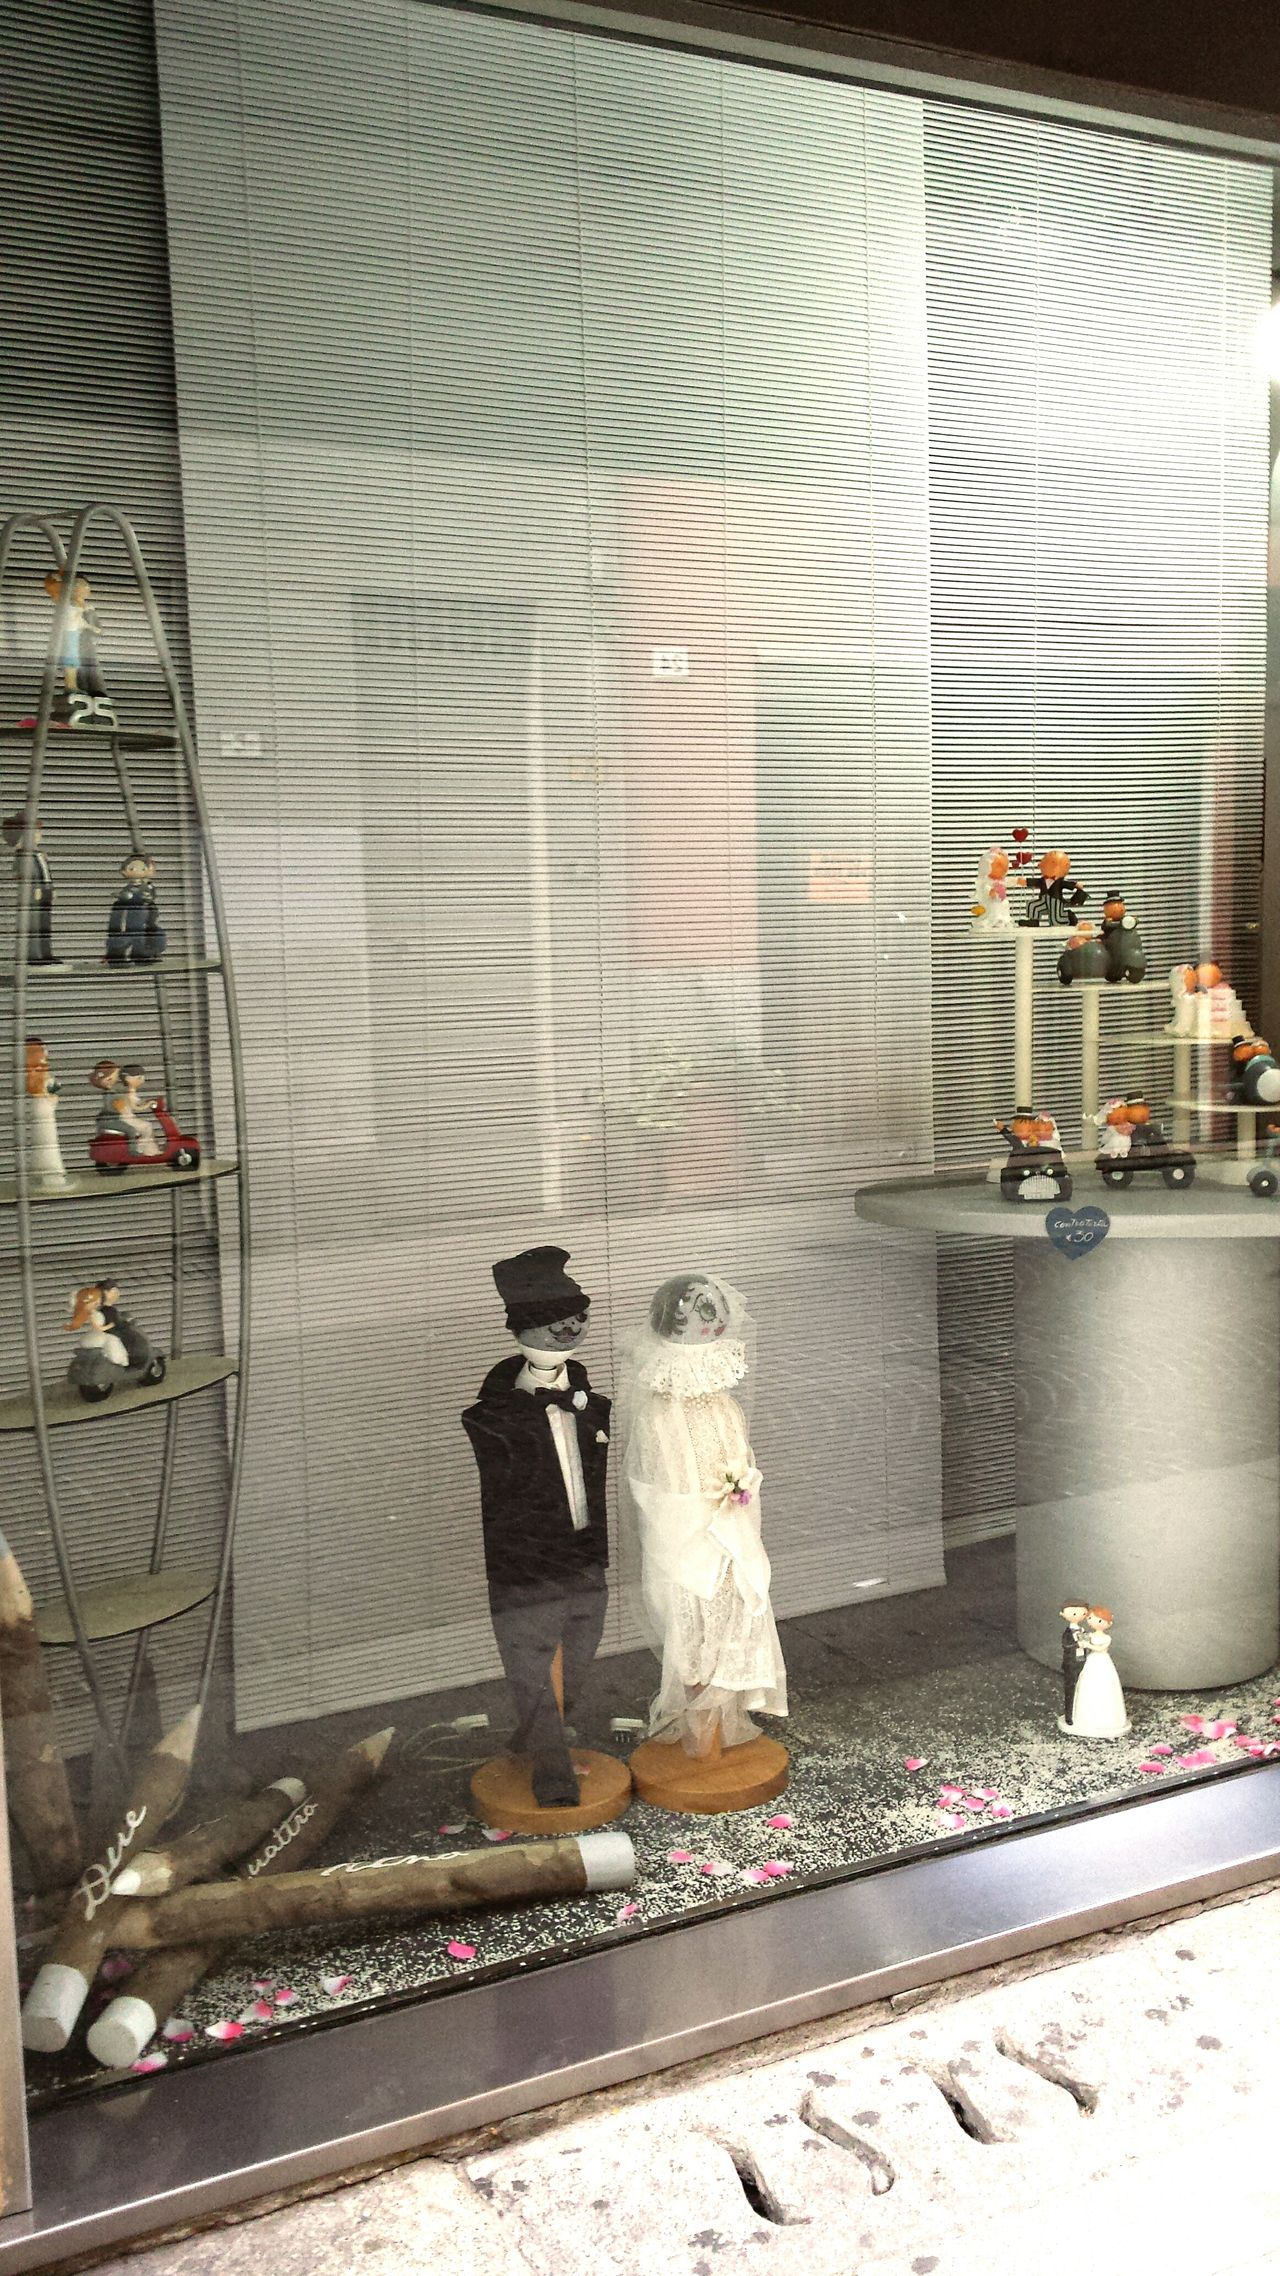 Sposi Matrimonio Giocattoli Divertimento Vetrina Vetrine Toys Giocattolo